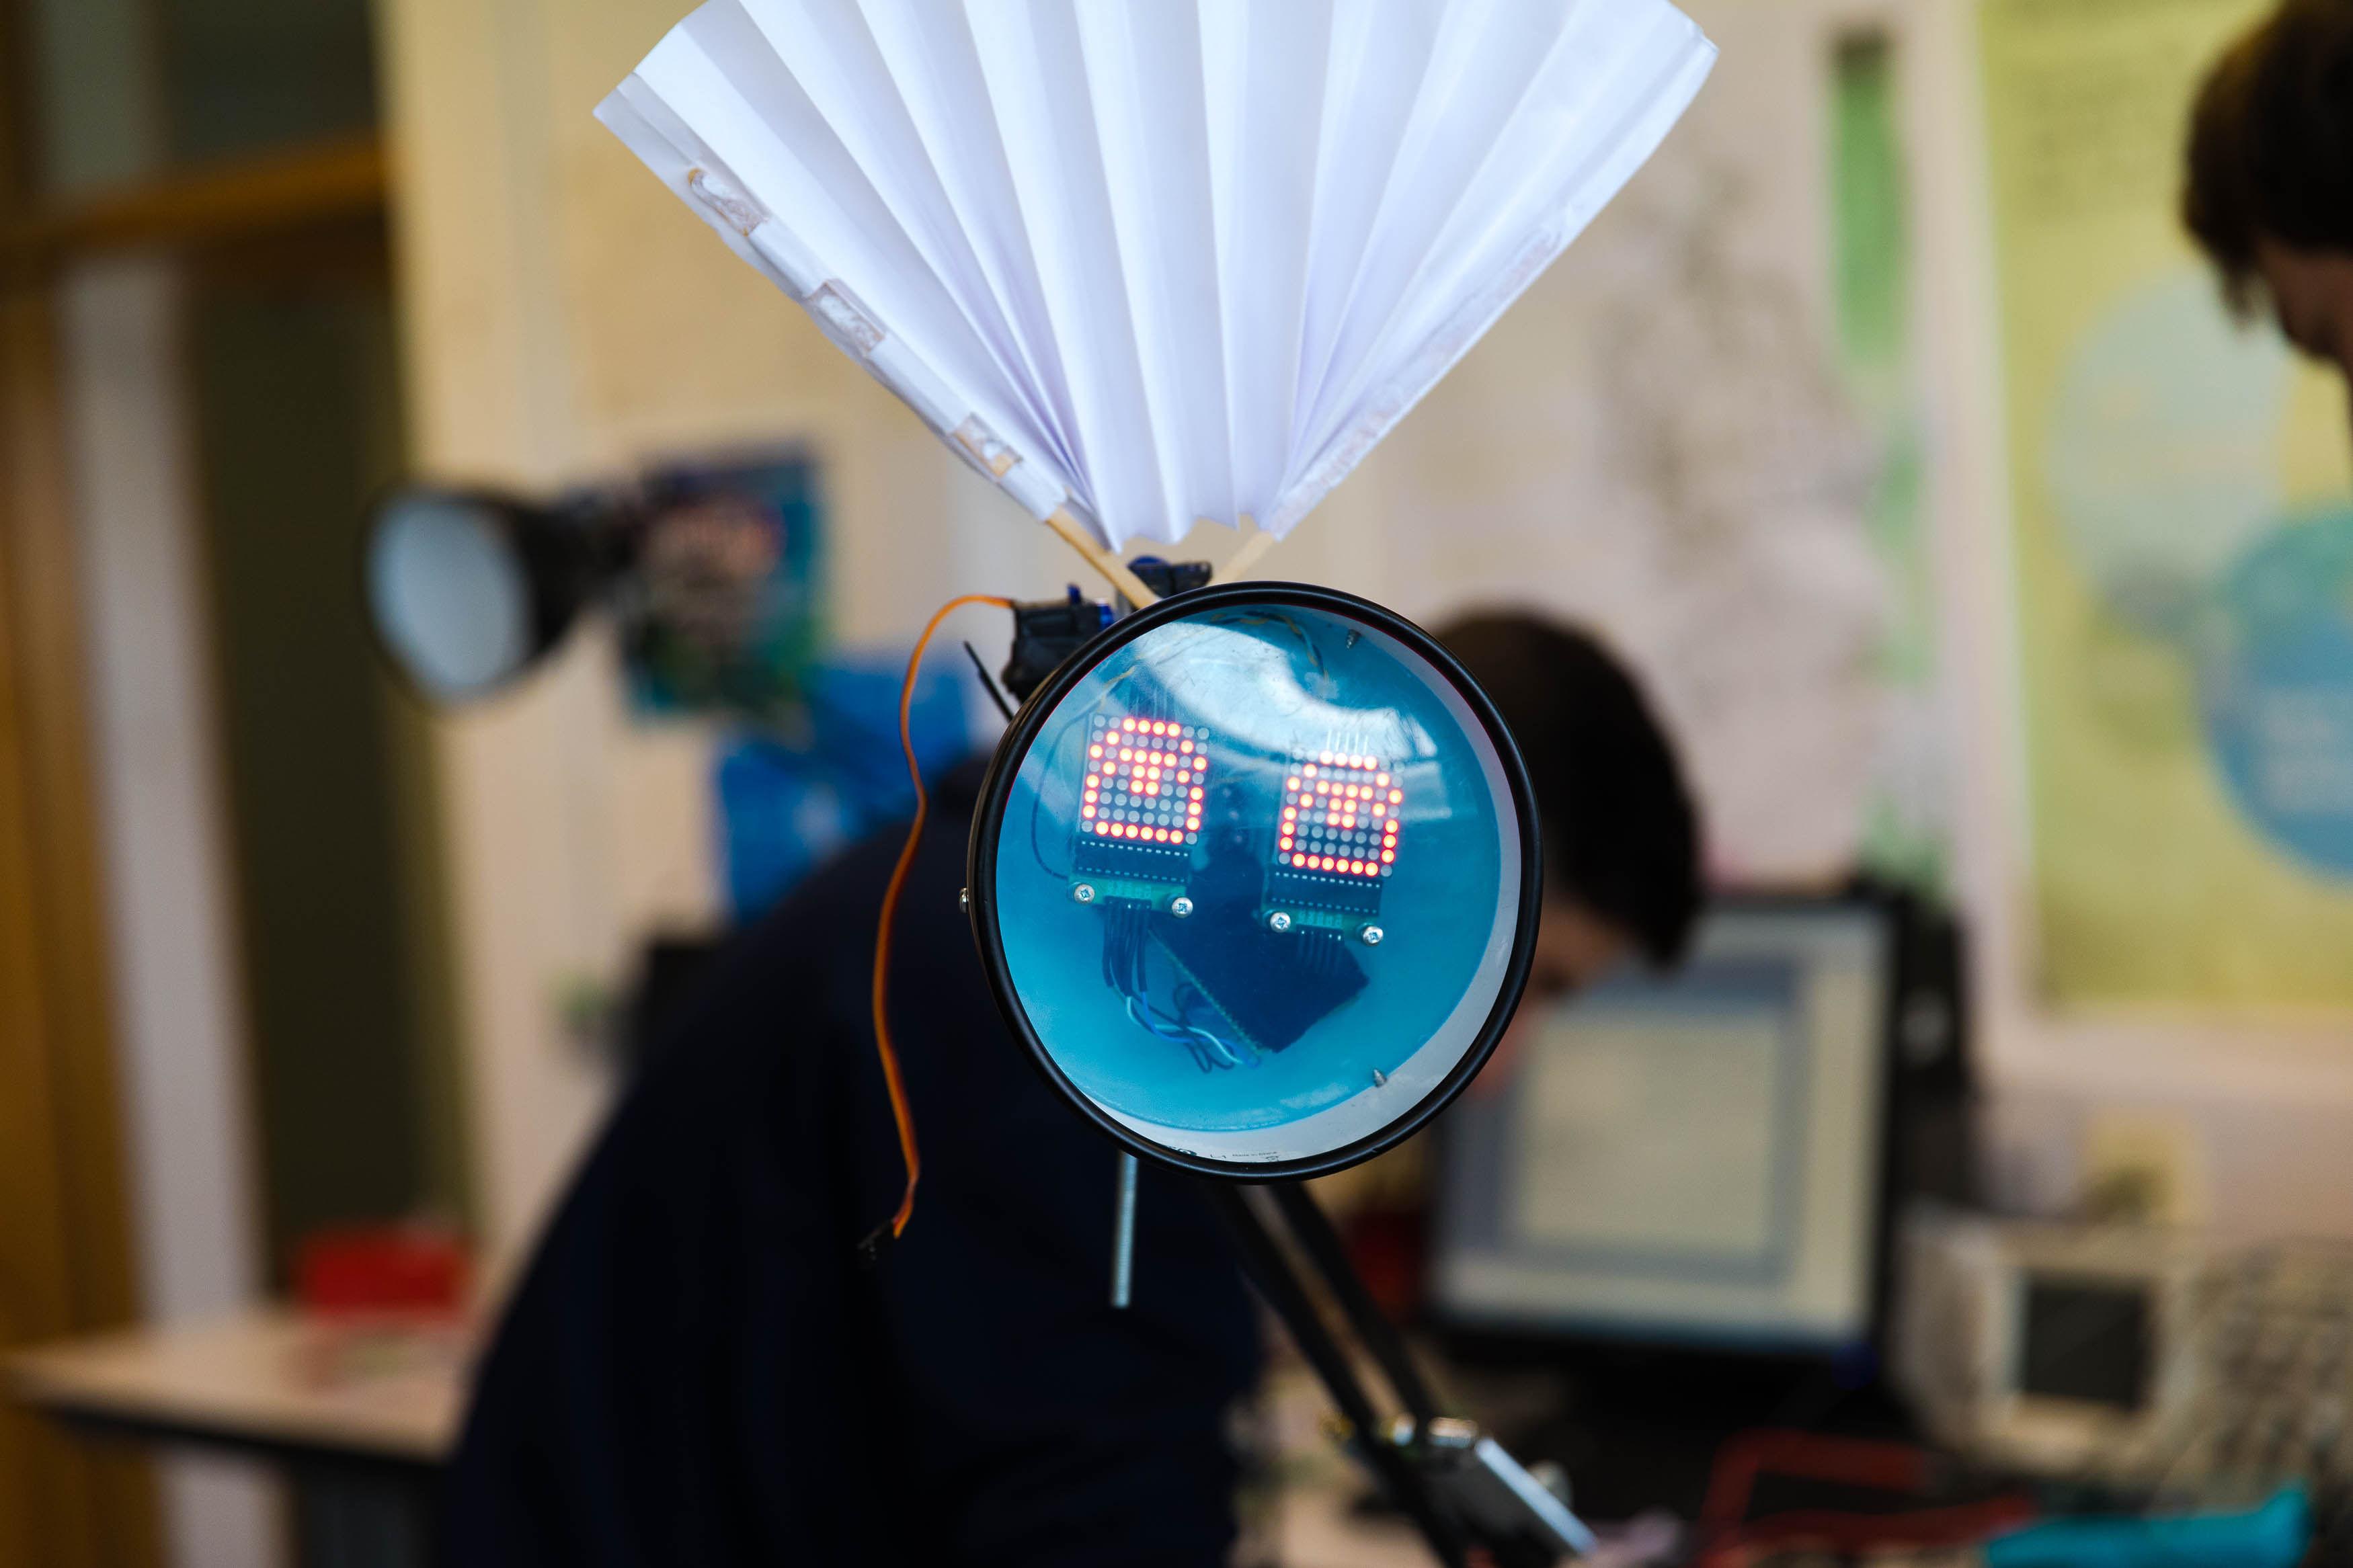 Female lampbot